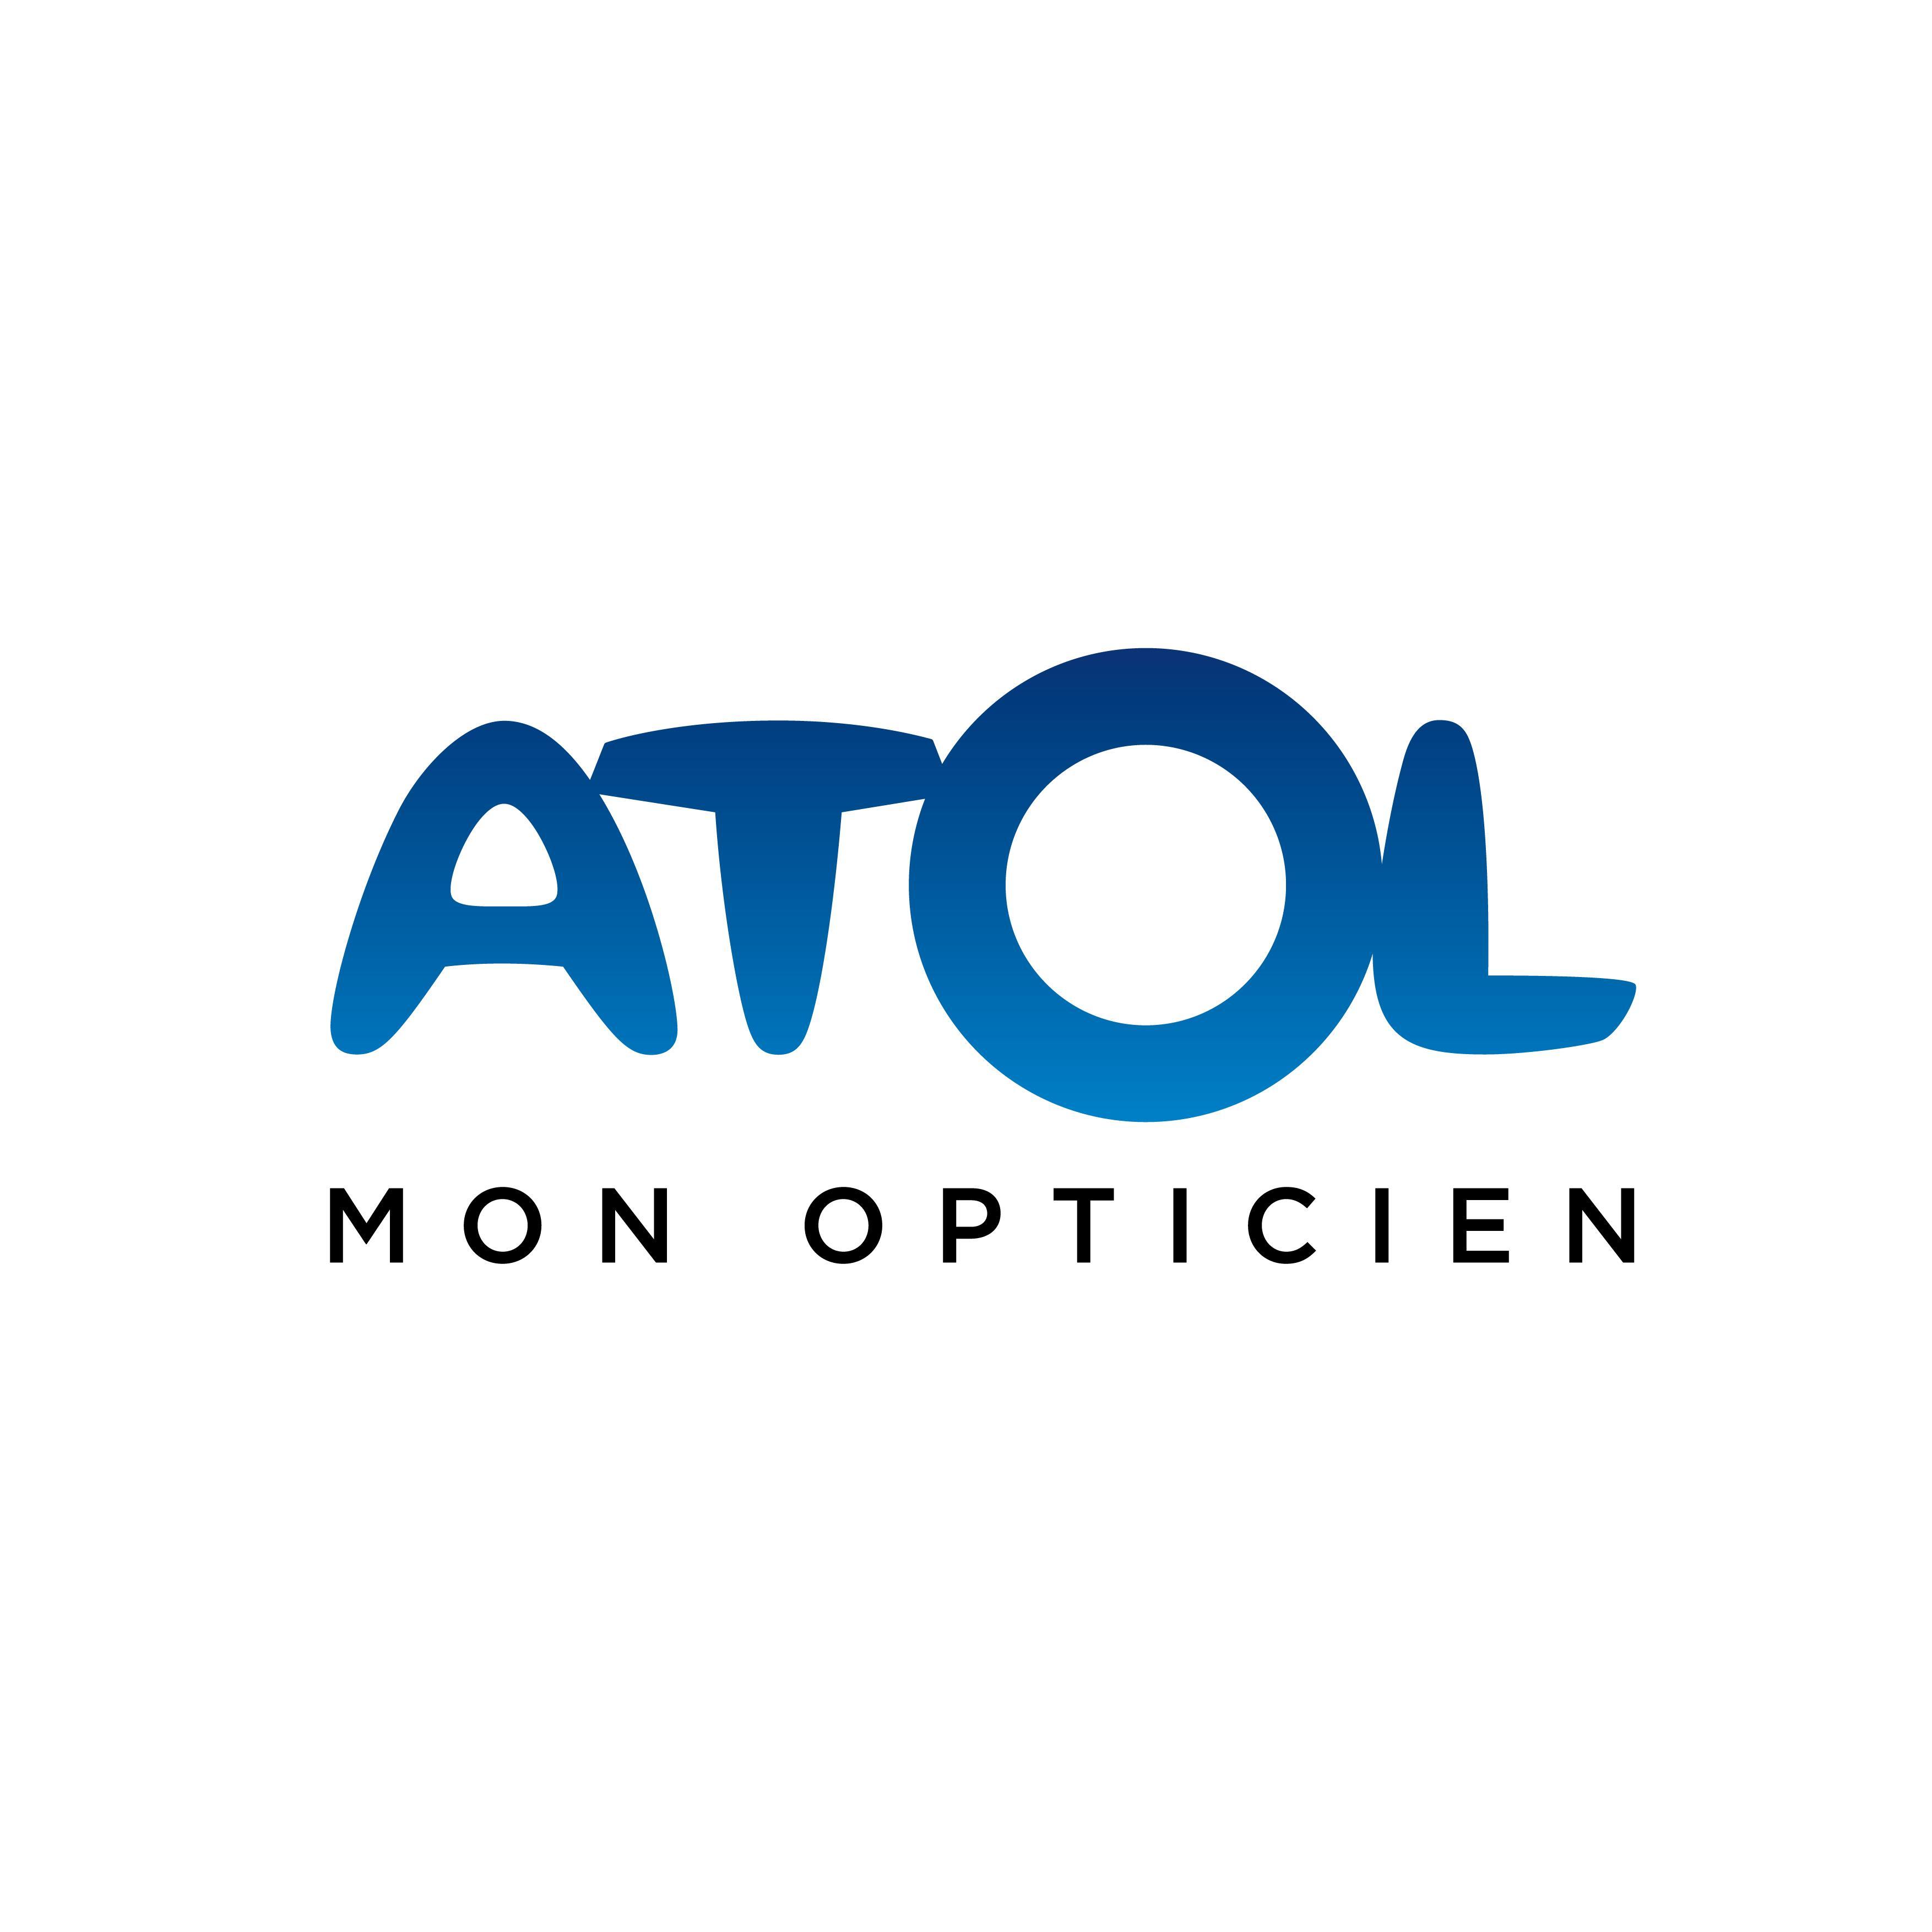 Atol Mon Opticien Isbergues